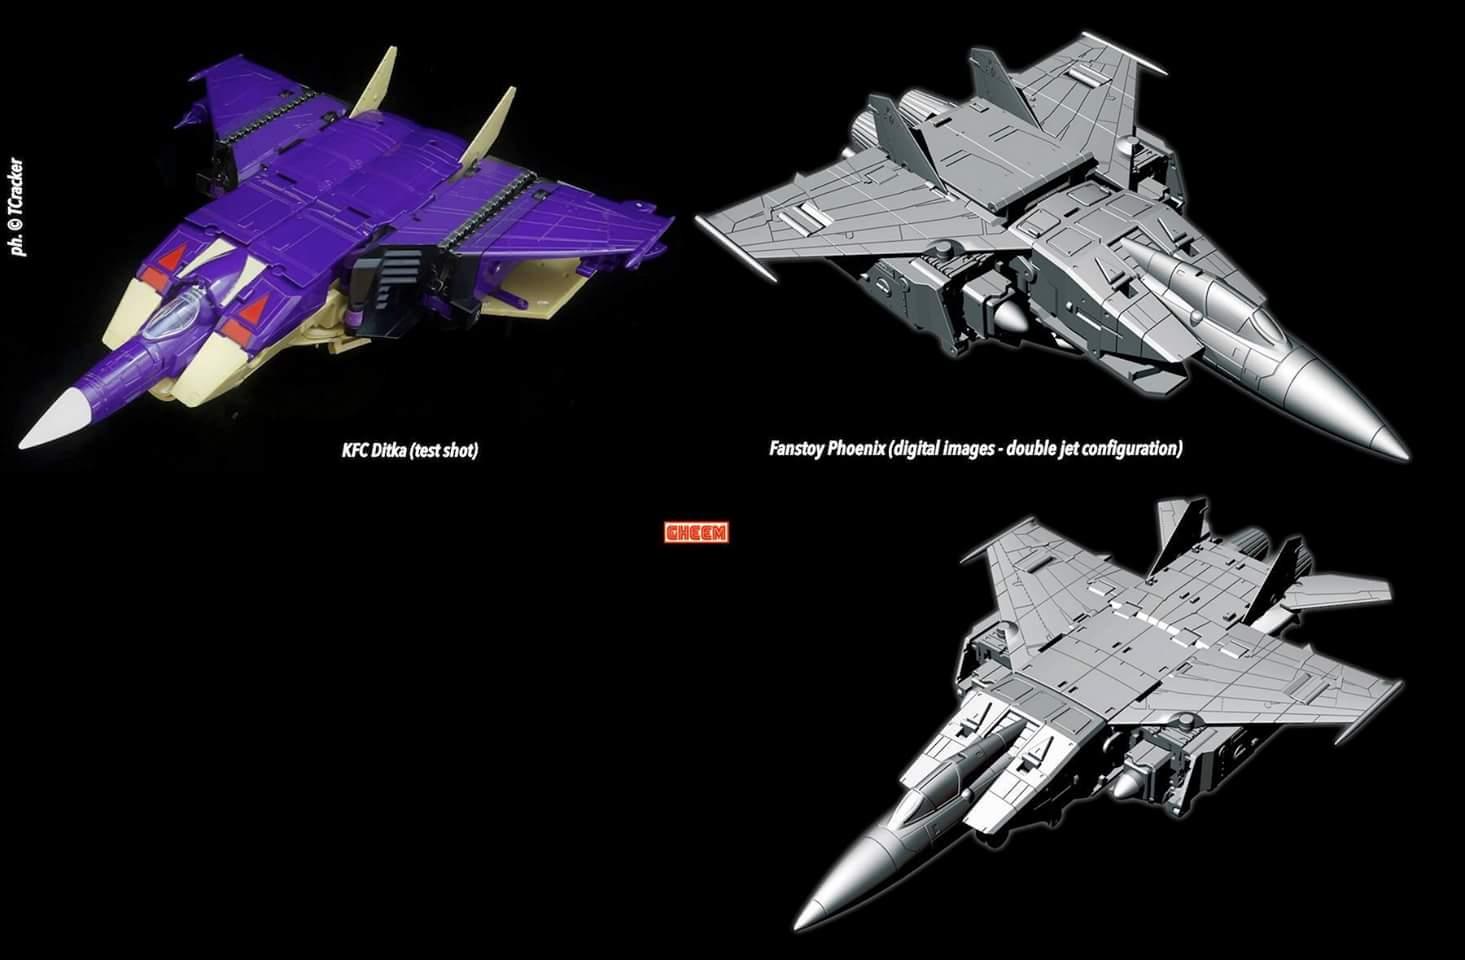 [Fanstoys] Produit Tiers - Jouet FT-21 Berserk - aka Blitzwing/Le Blitz LIVCDZHr